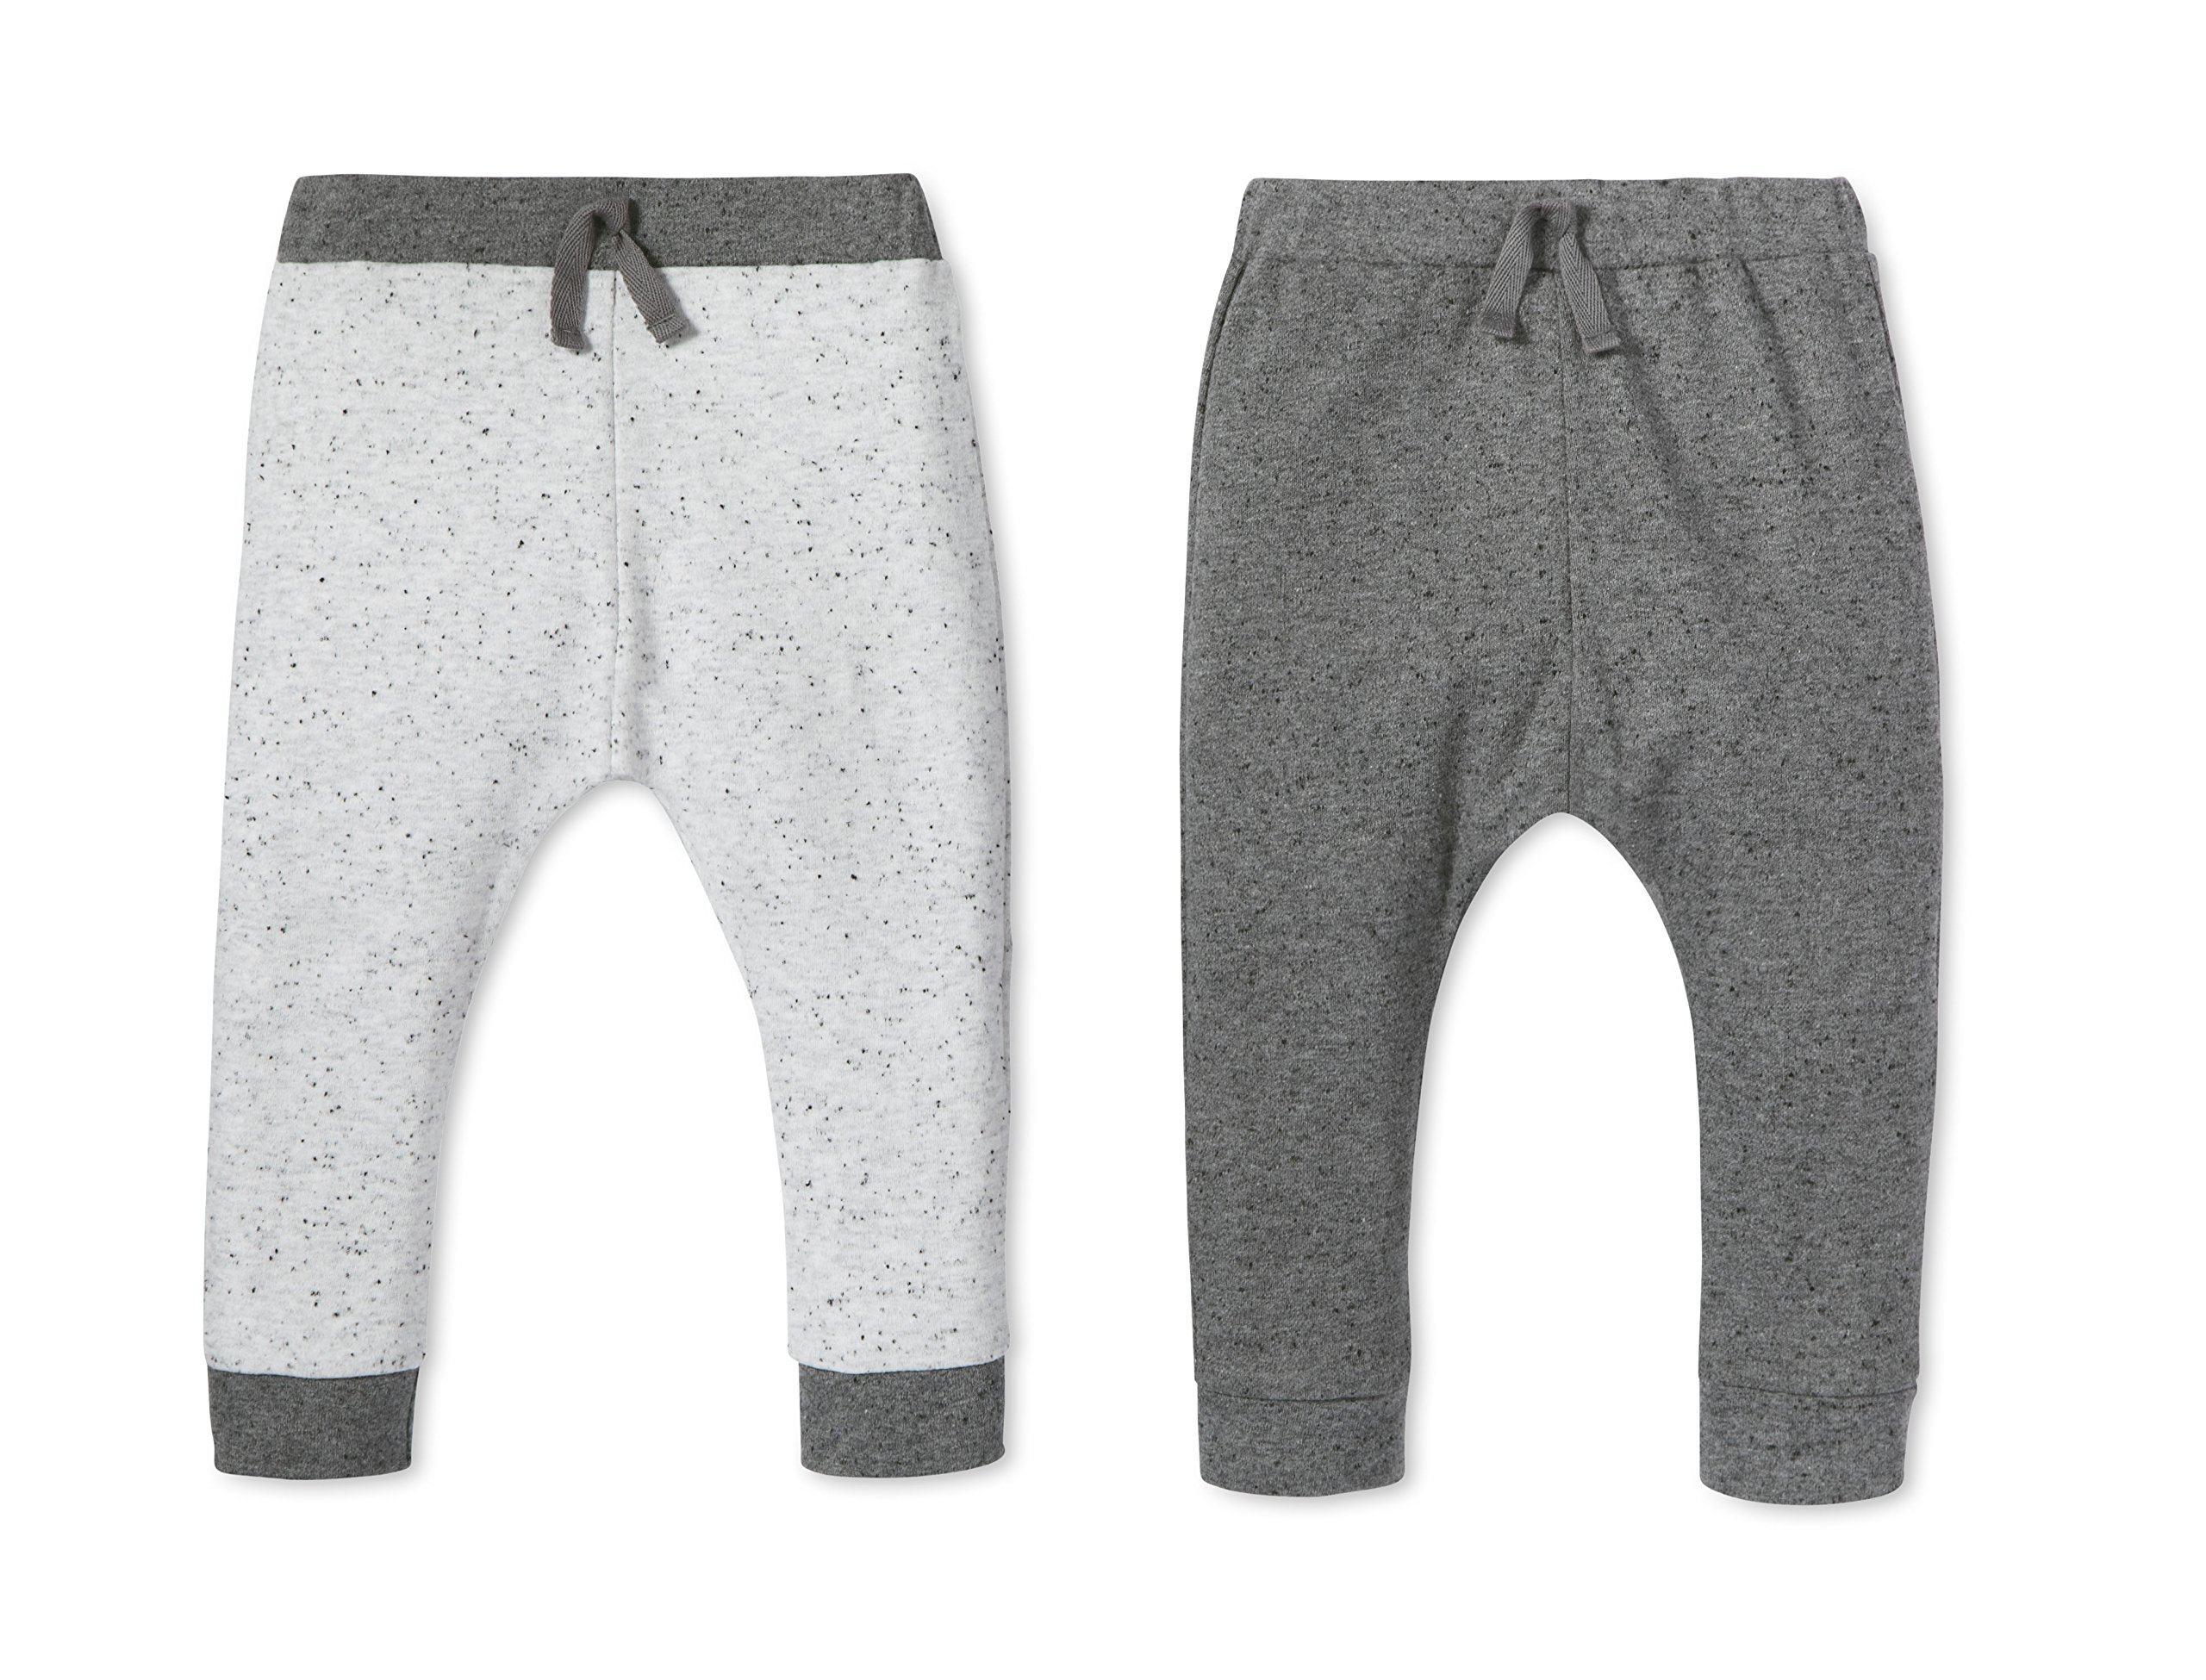 Lamaze Baby Organic 2 Pack Pants, Grey, 12M